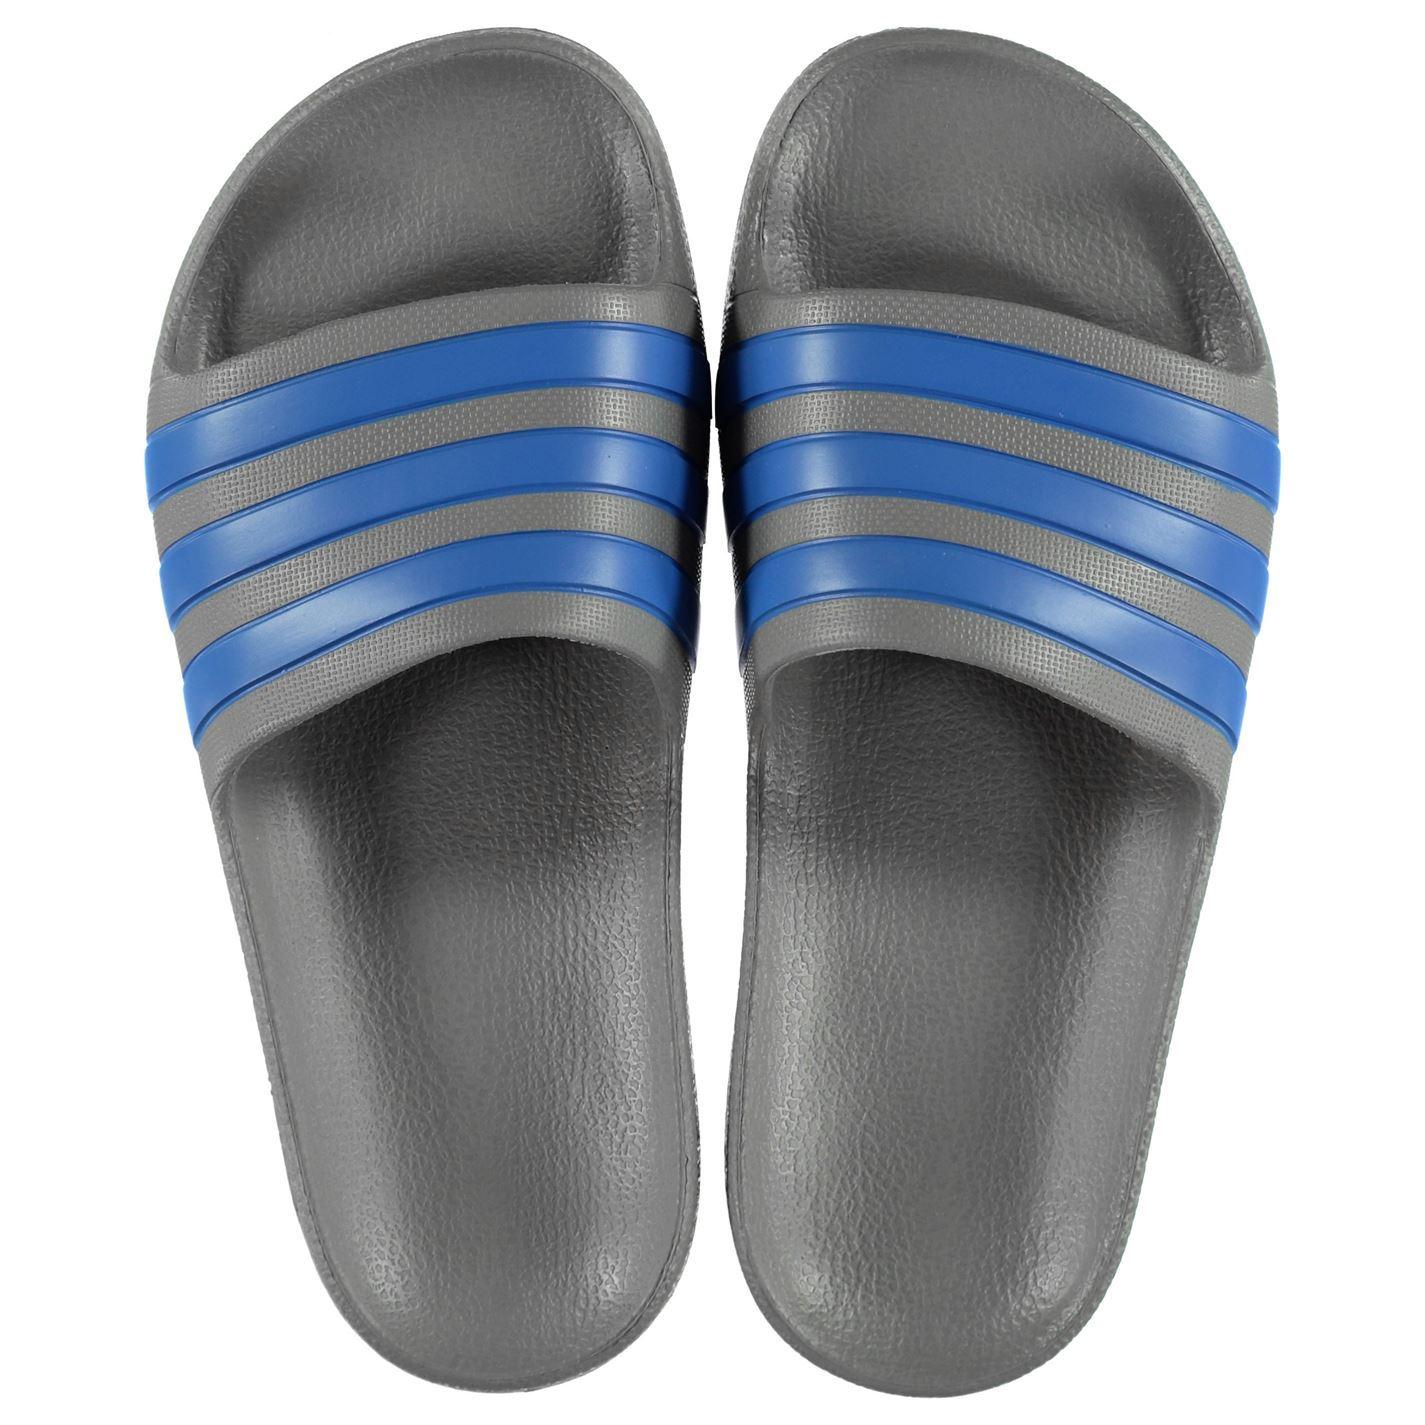 miniatura 16 - ADIDAS-Duramo-Slide-Piscina-Scarpe-Bambino-Ragazzo-Sandali-Infradito-Spiaggia-Scarpe-Thongs